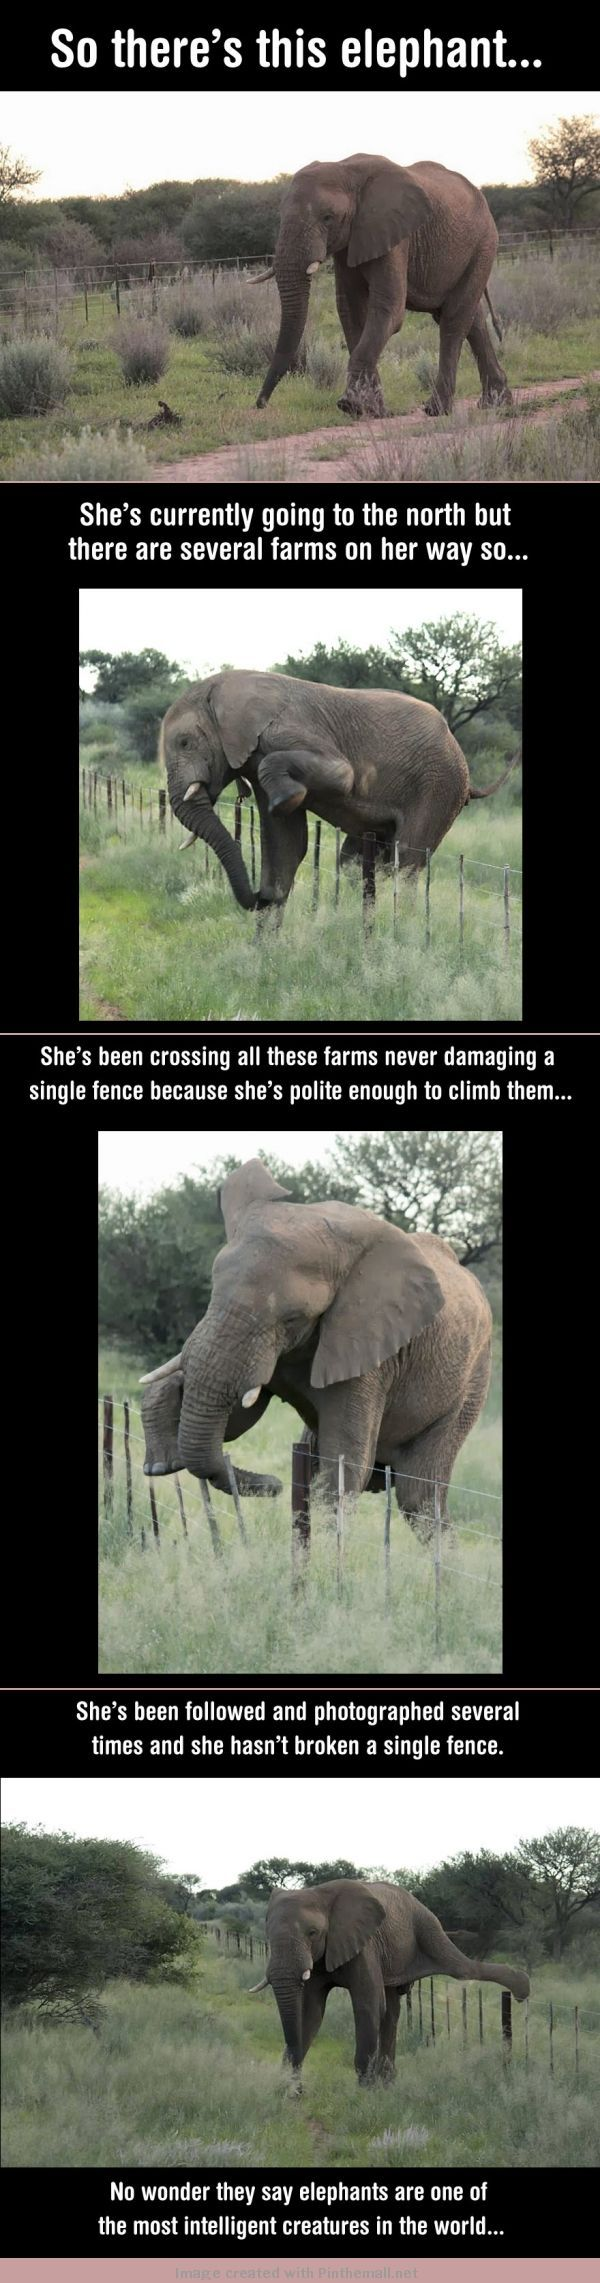 This polite elephant made us awww